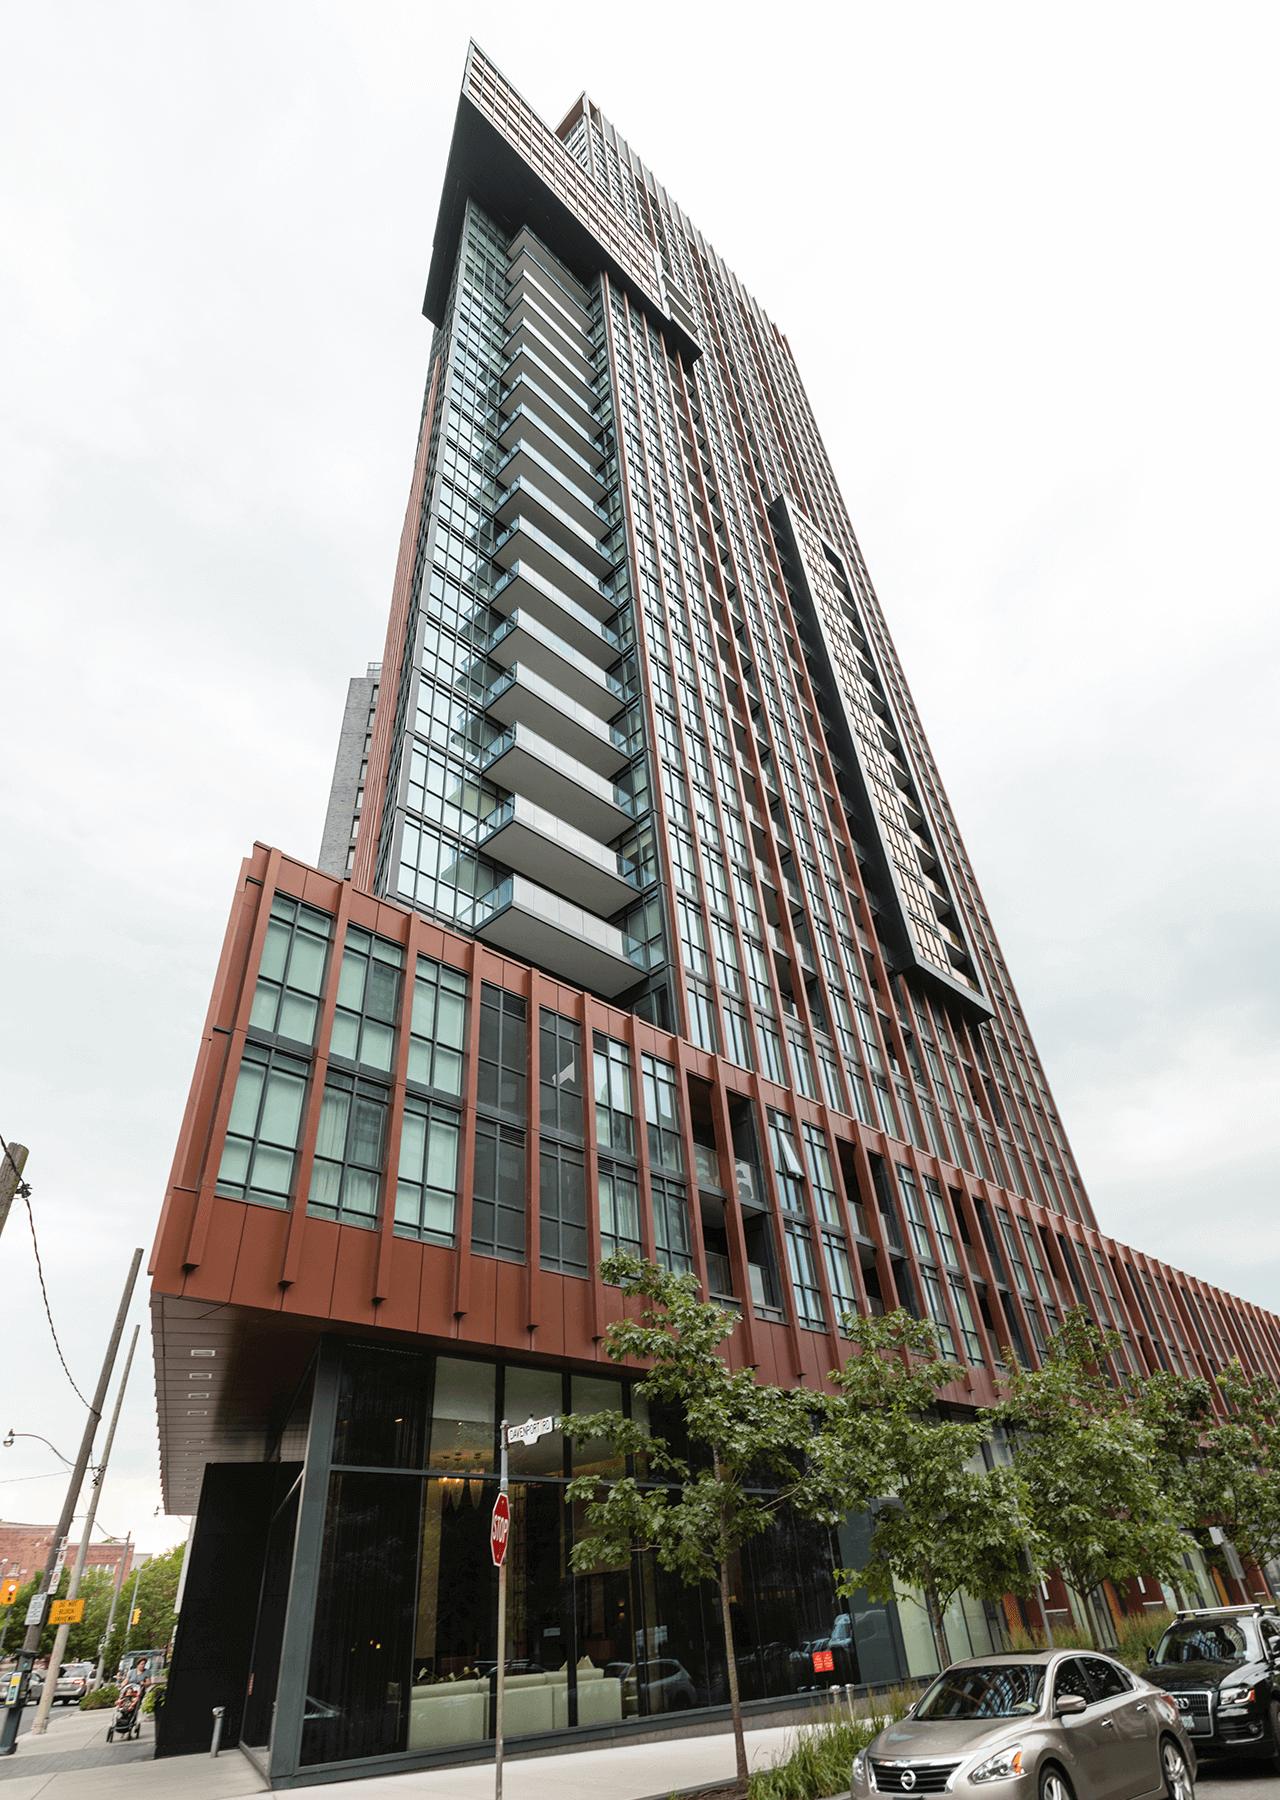 32 Davenport Building